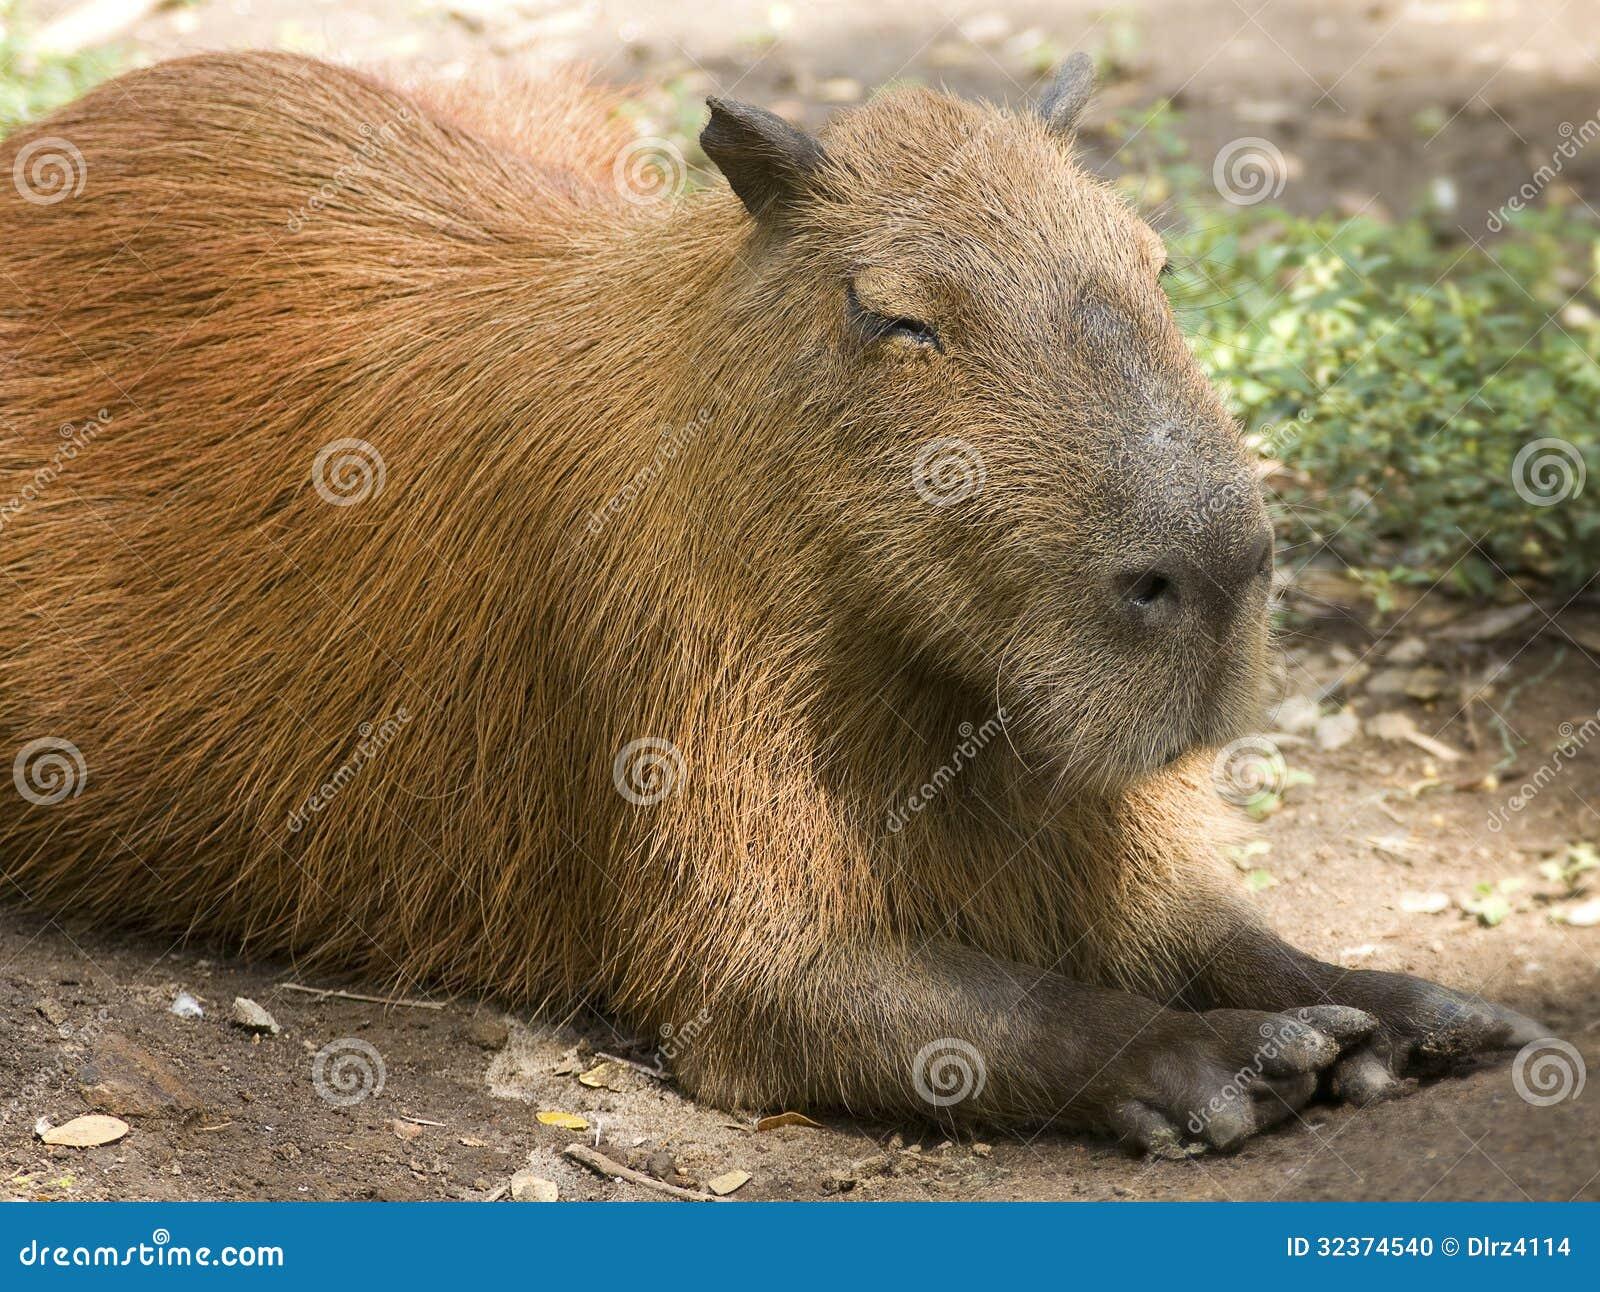 Capybara laying down stock photo. Image of biggest, grass ...